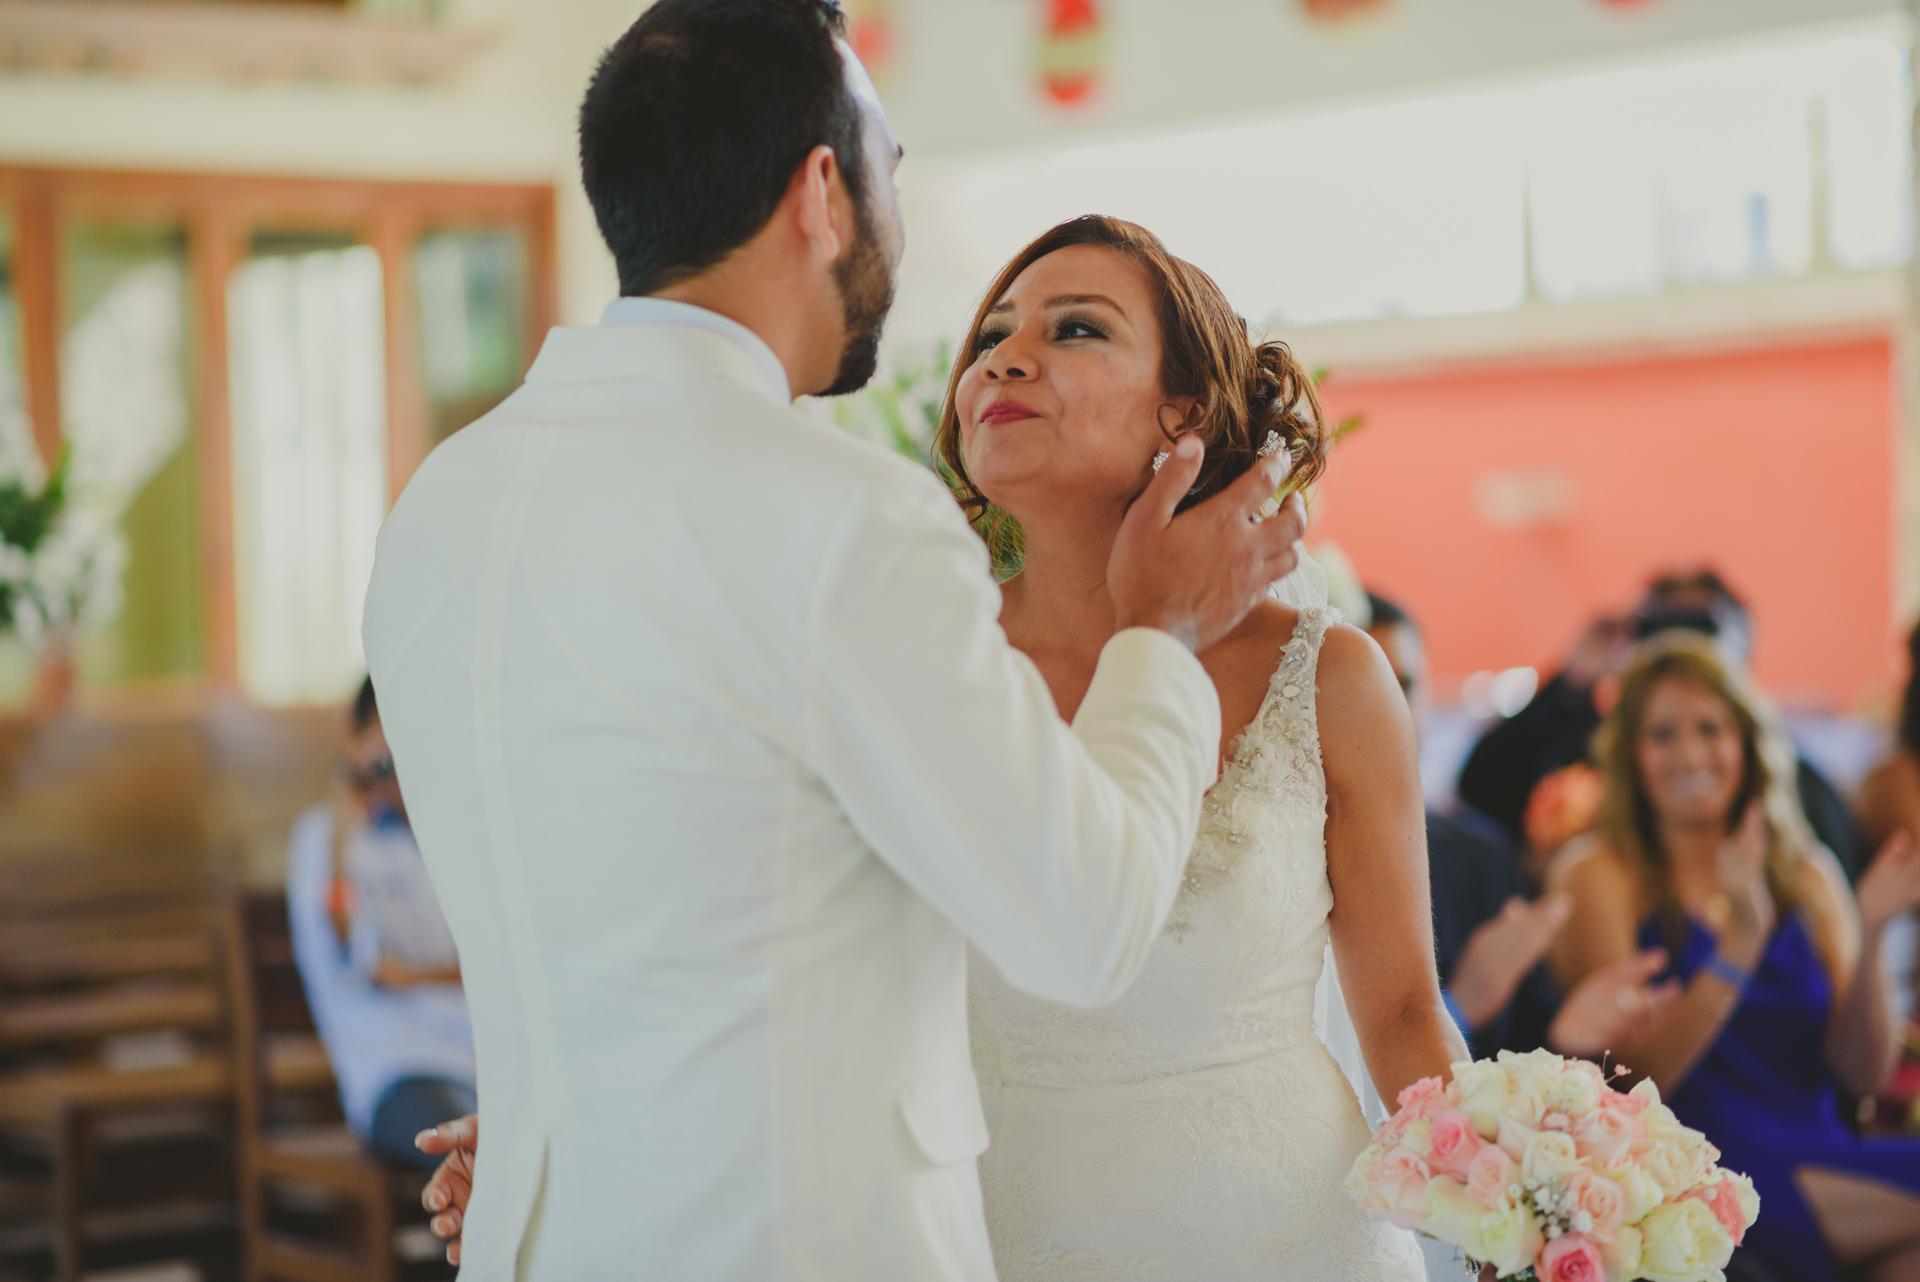 Wedding N&M BLOG luishoudin.com (54 de 174)